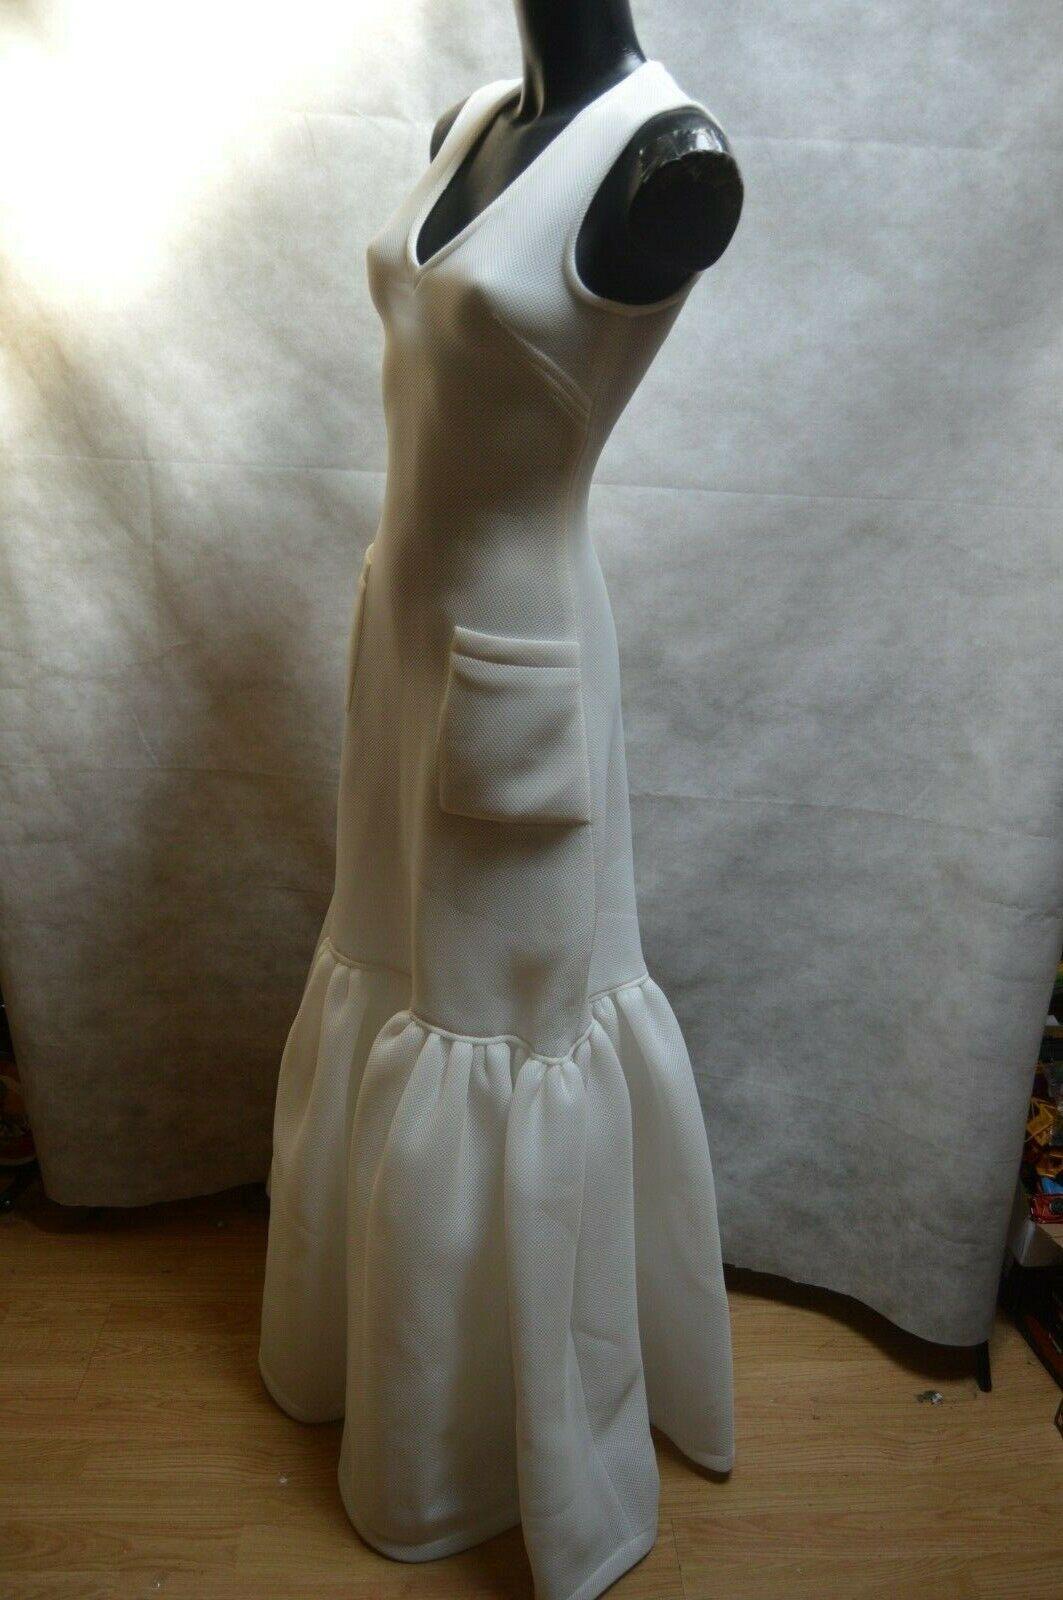 Dress Marie Alexis Mabille Größe XS 34 Dress   Abito  Vestido Dress Wedding New